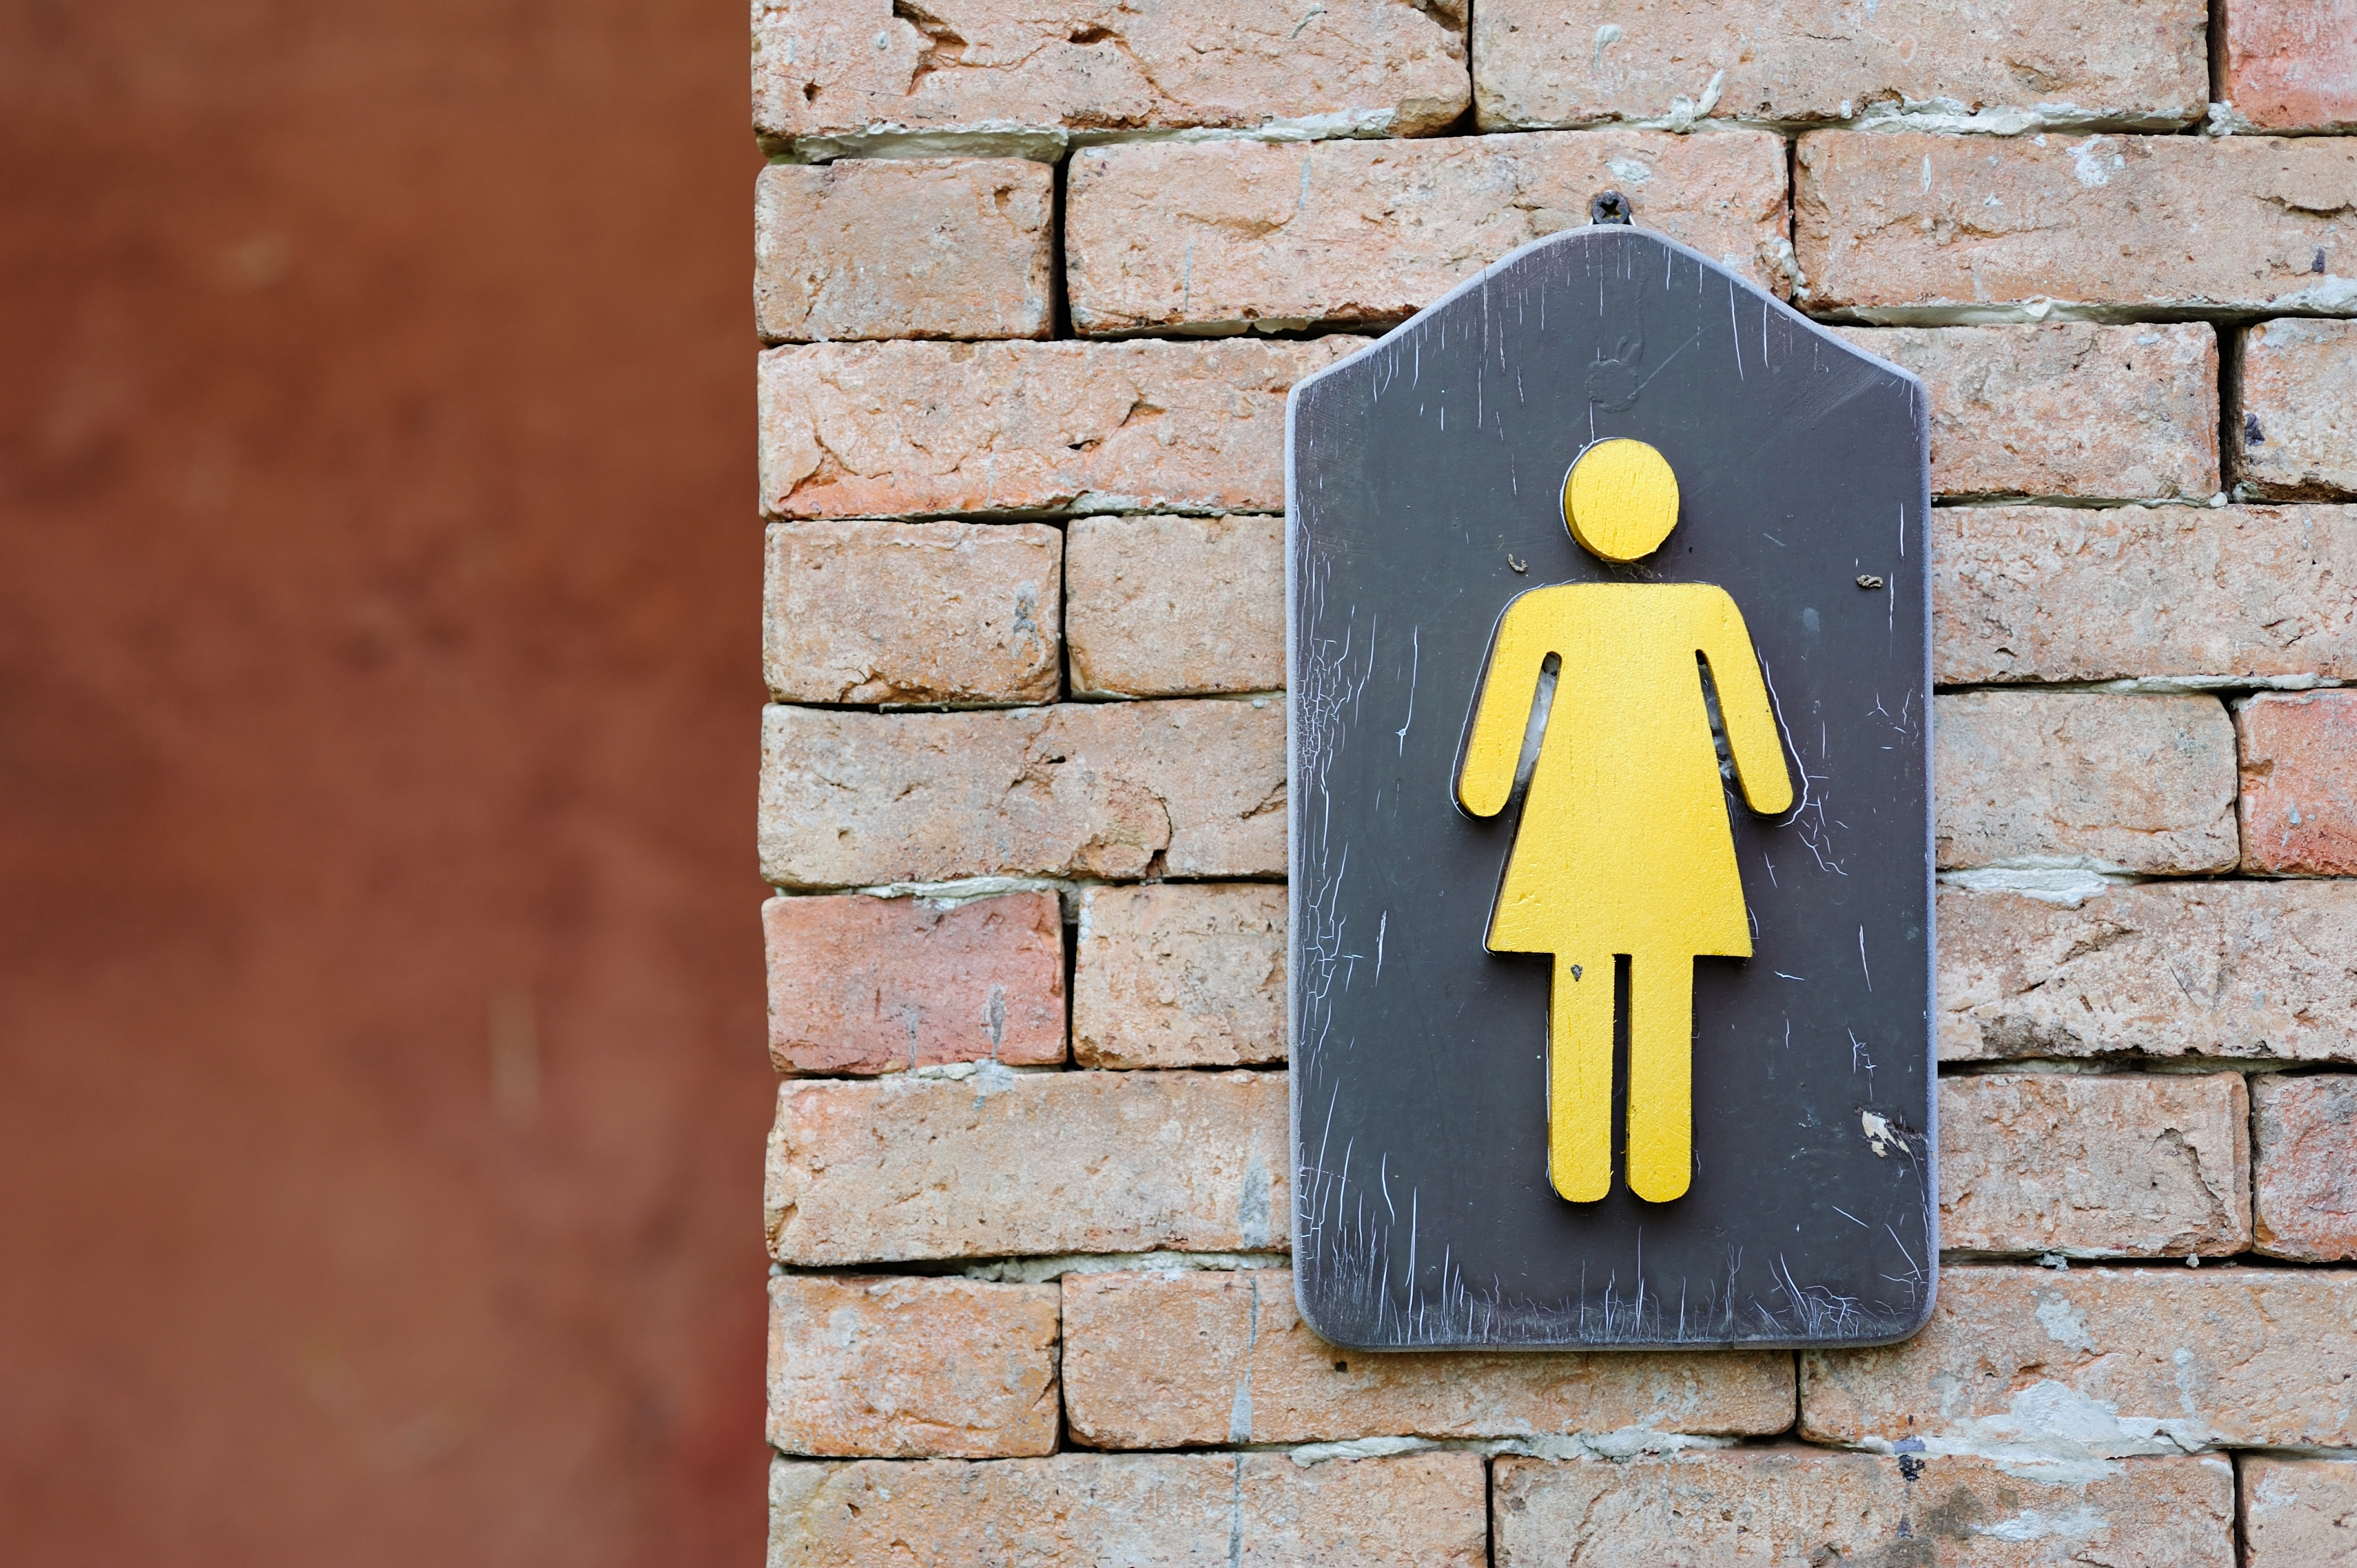 Woman's universal bathroom symbol - incontinence